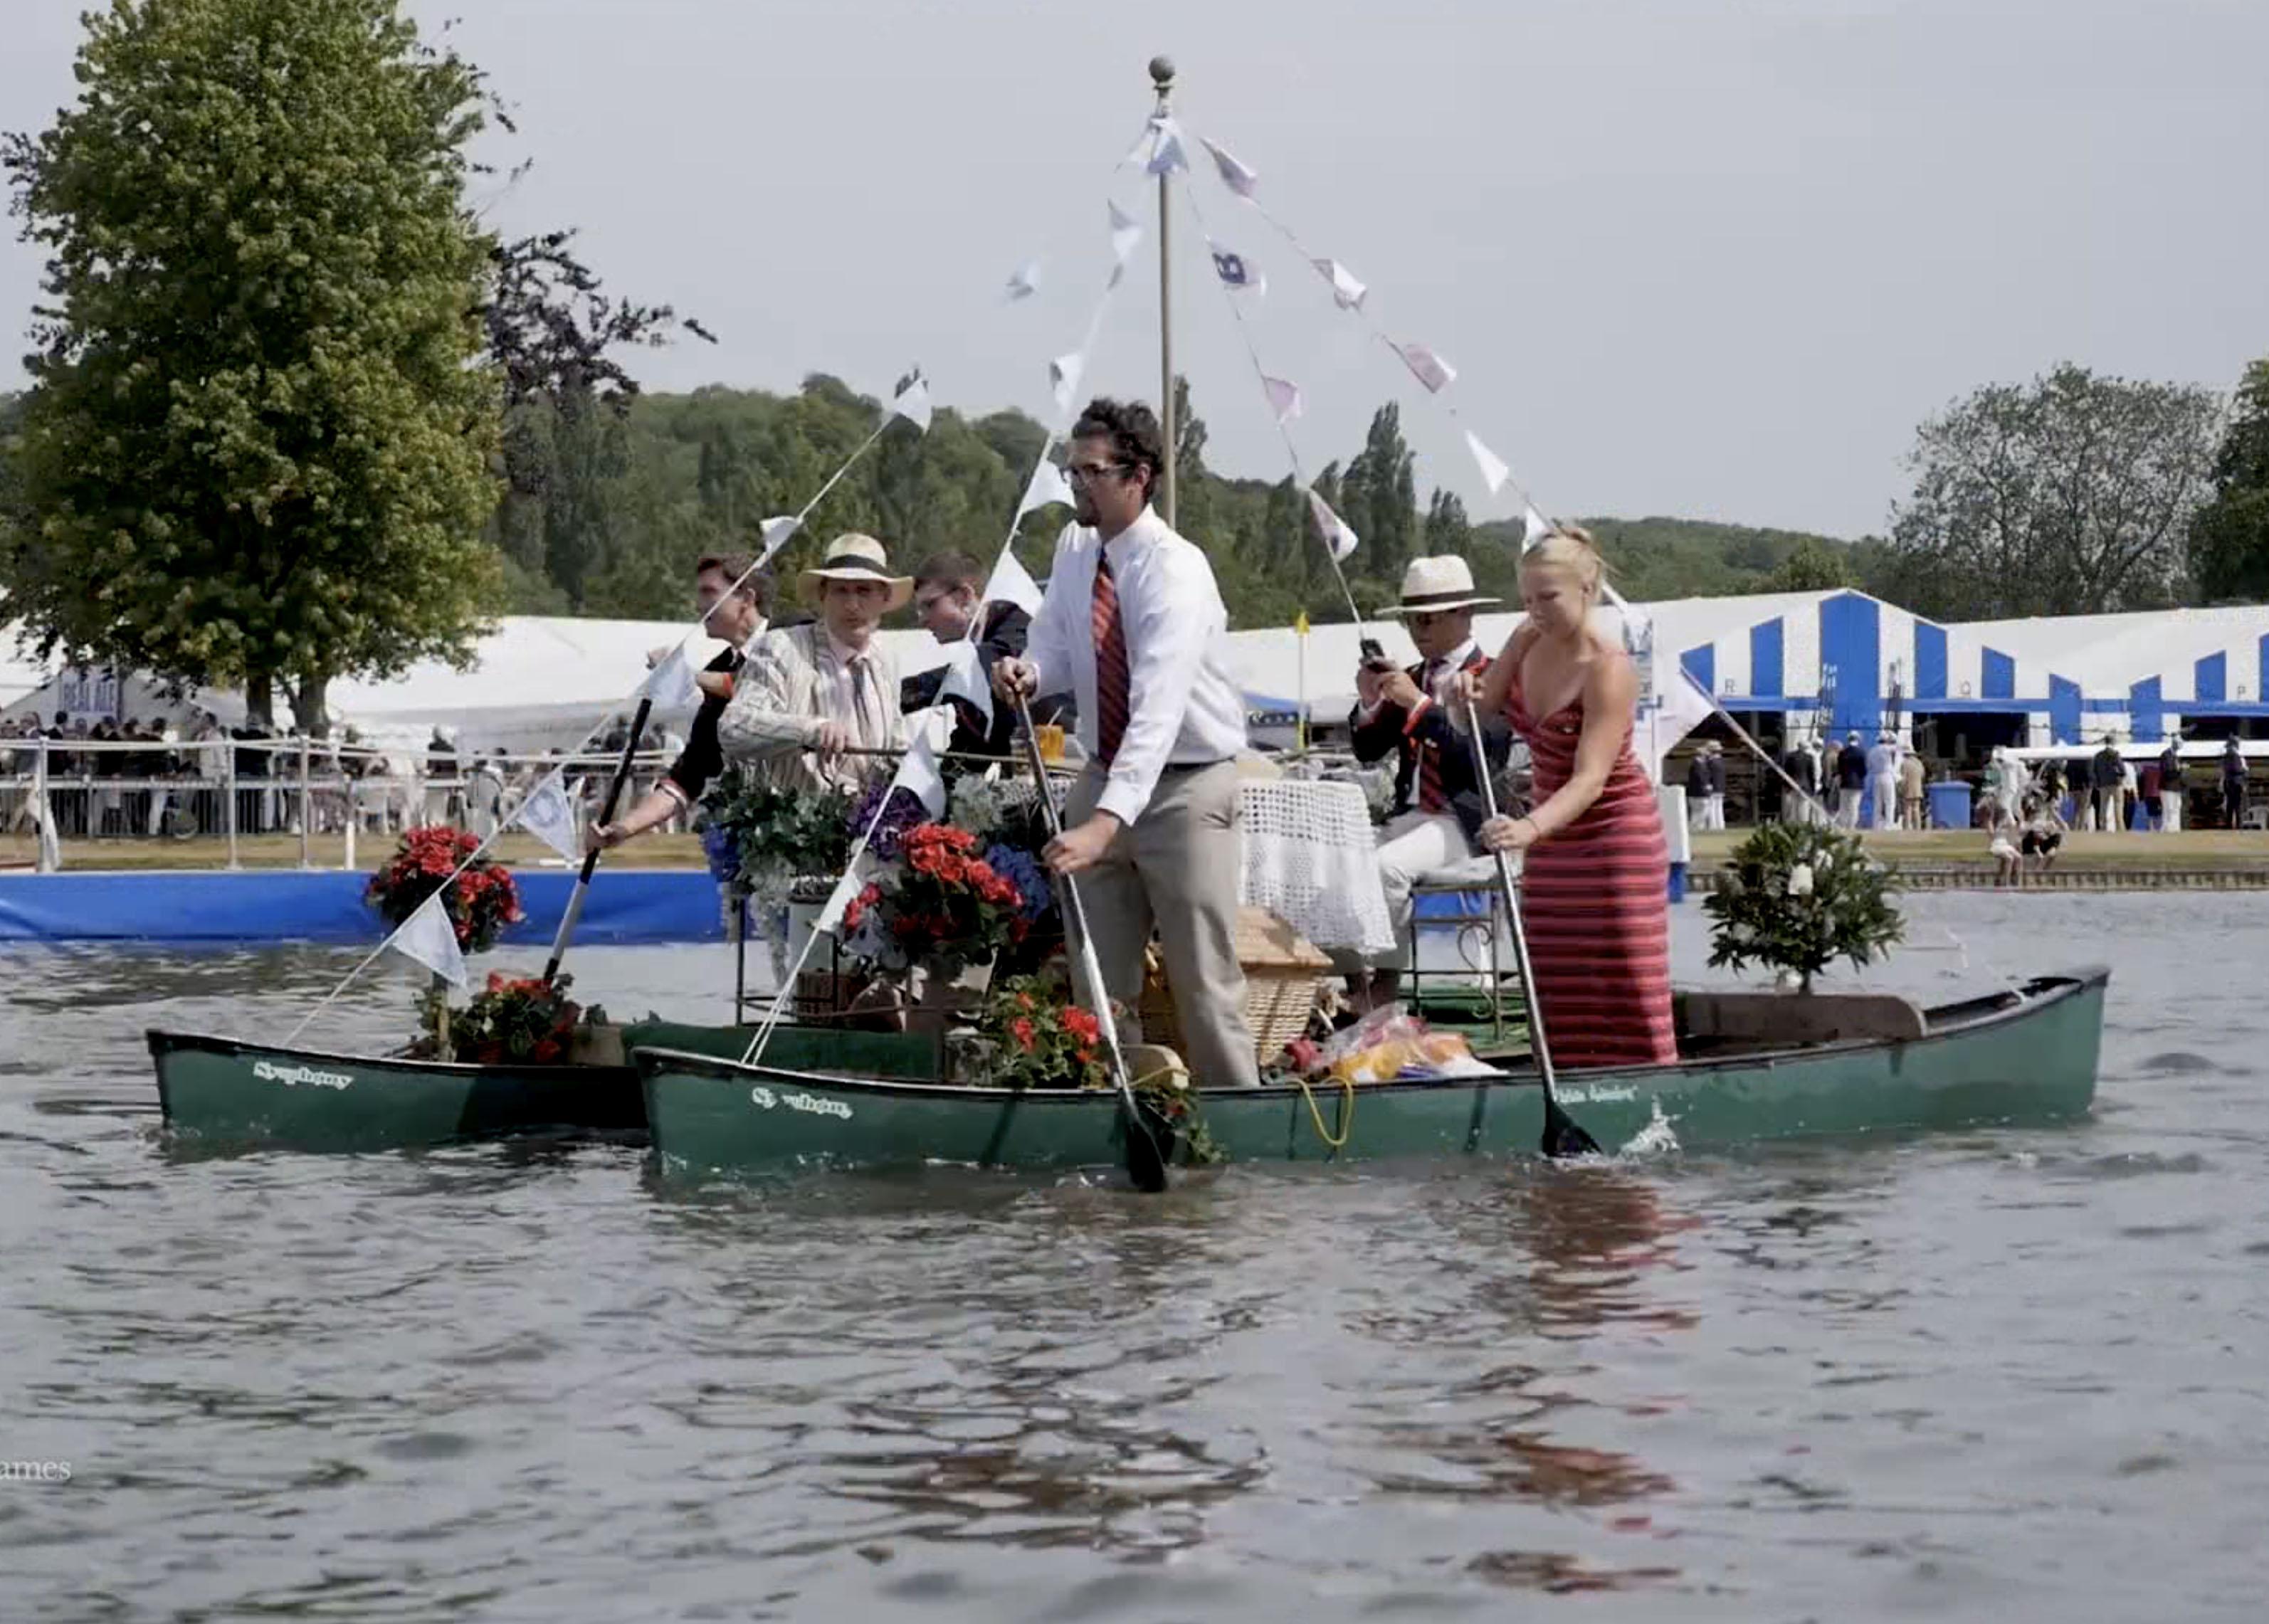 Henley Town Council - Boat sailing through Henley